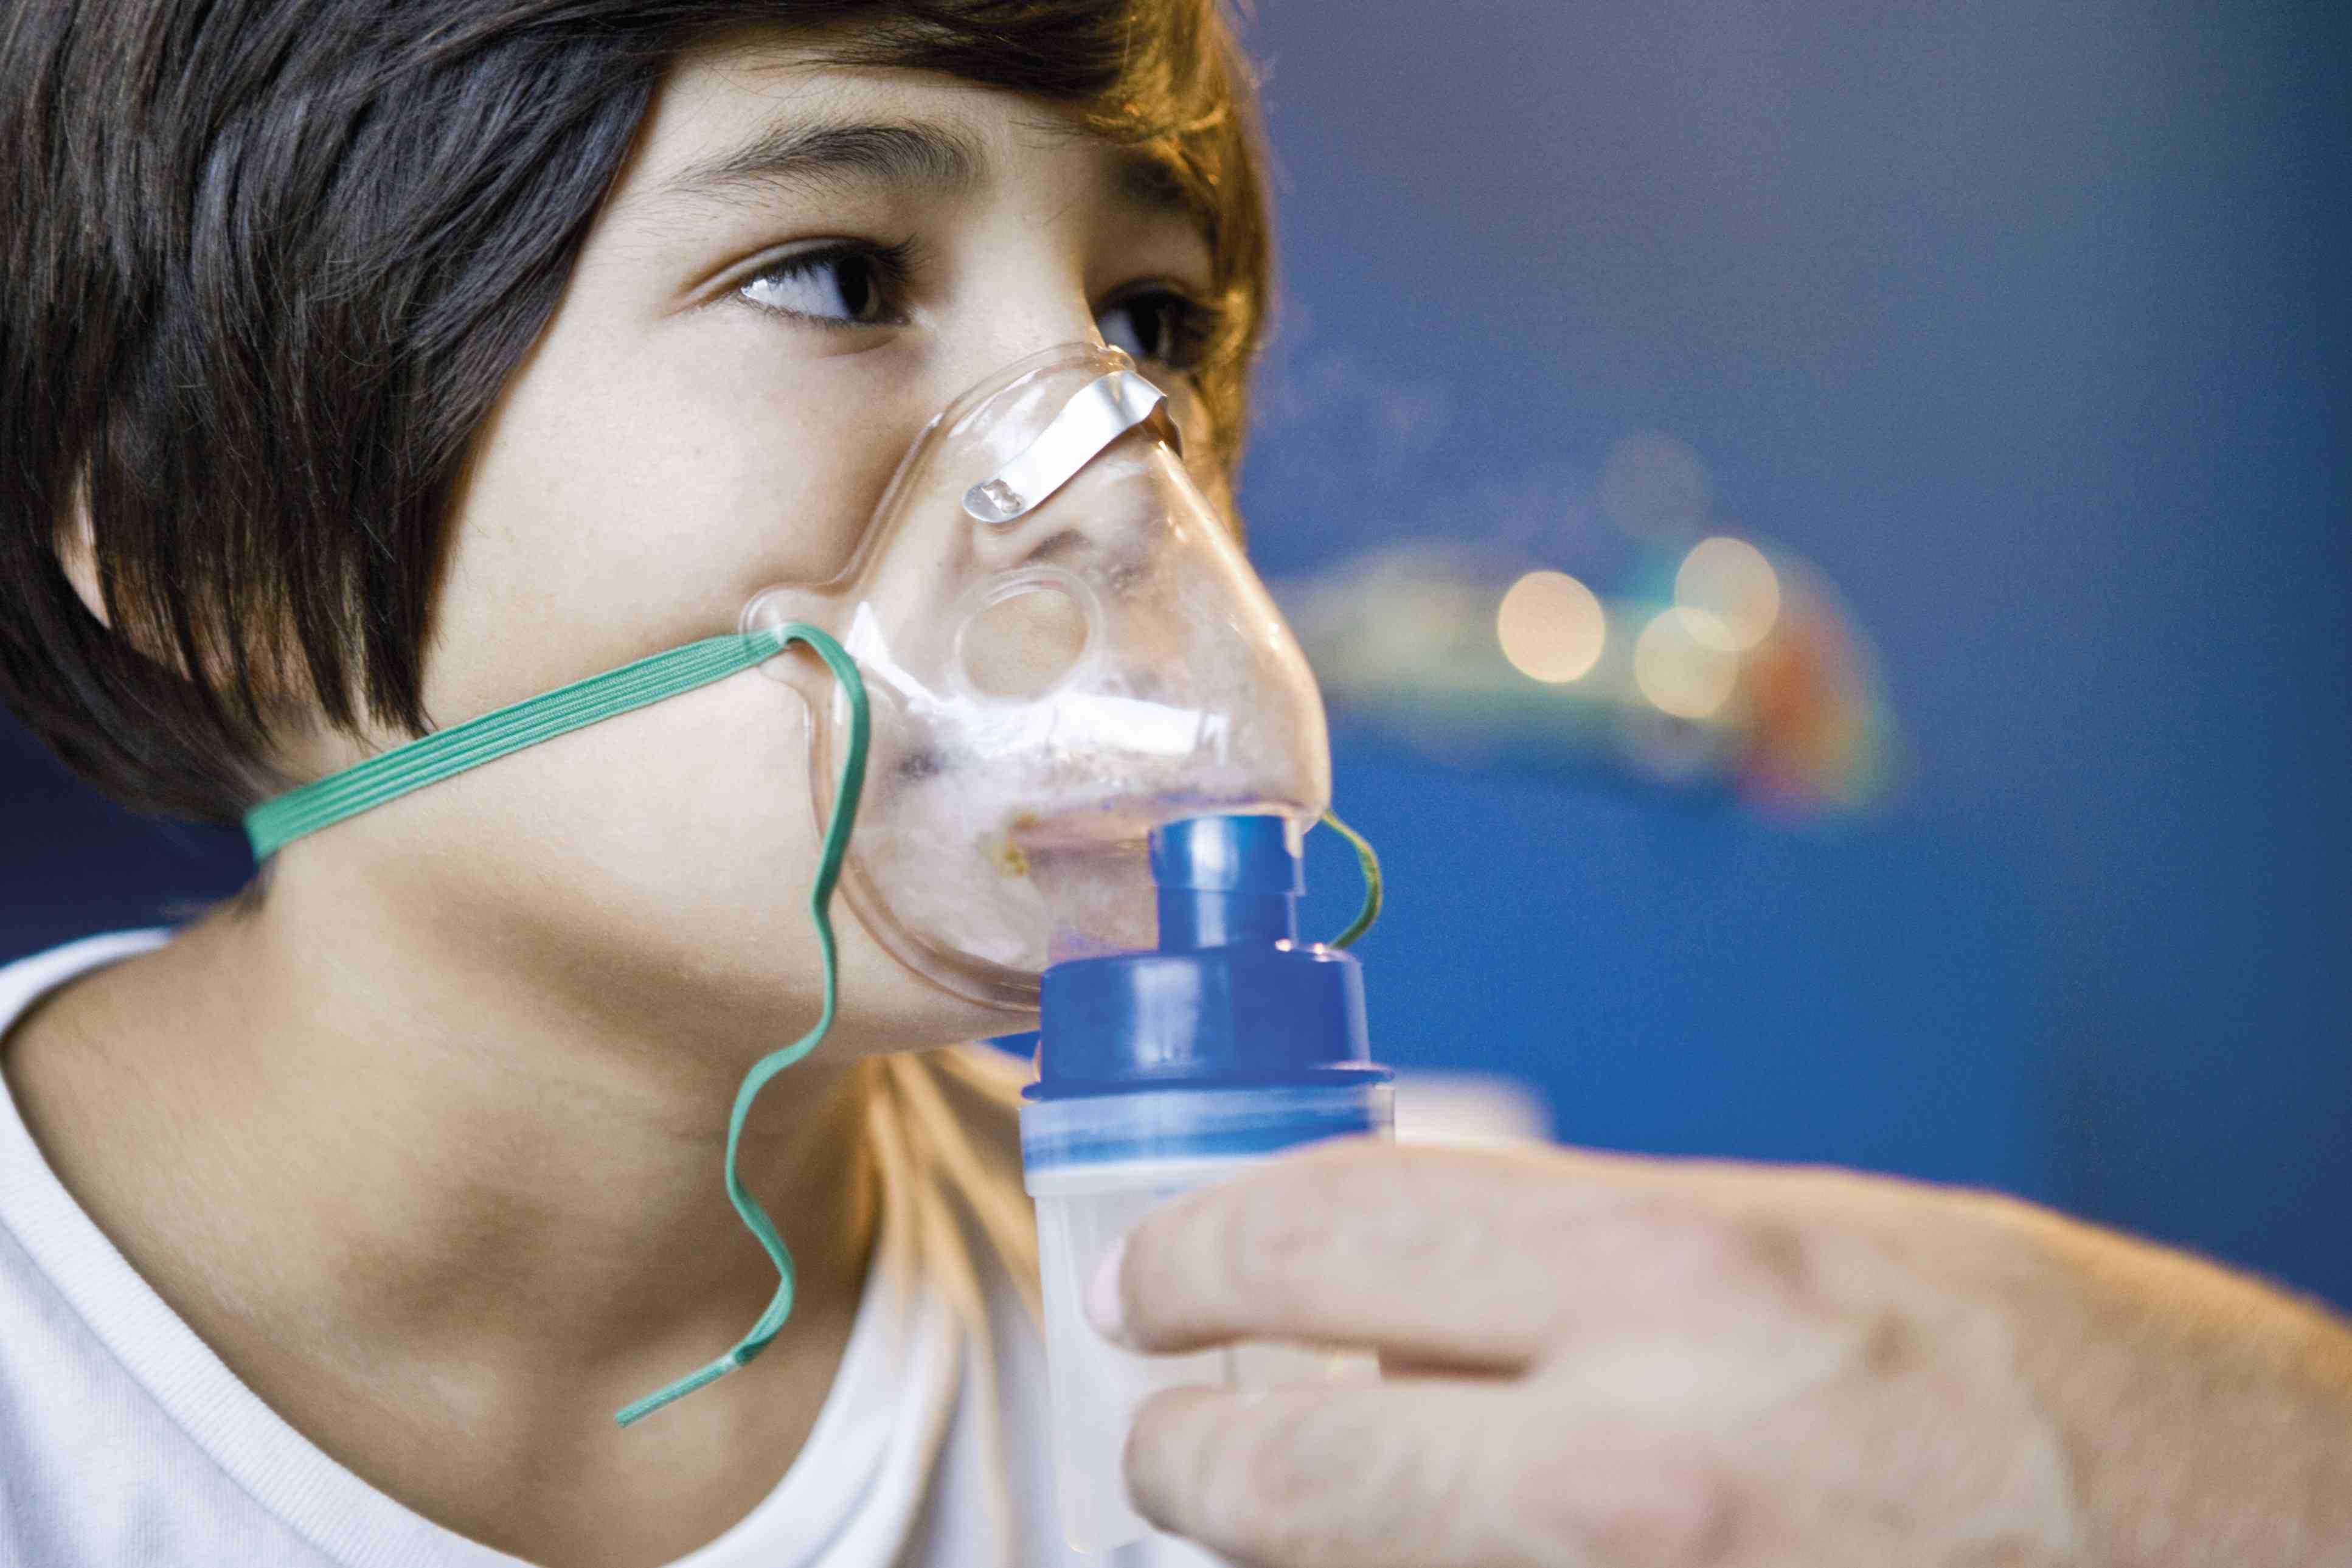 Child having a breathing treatment